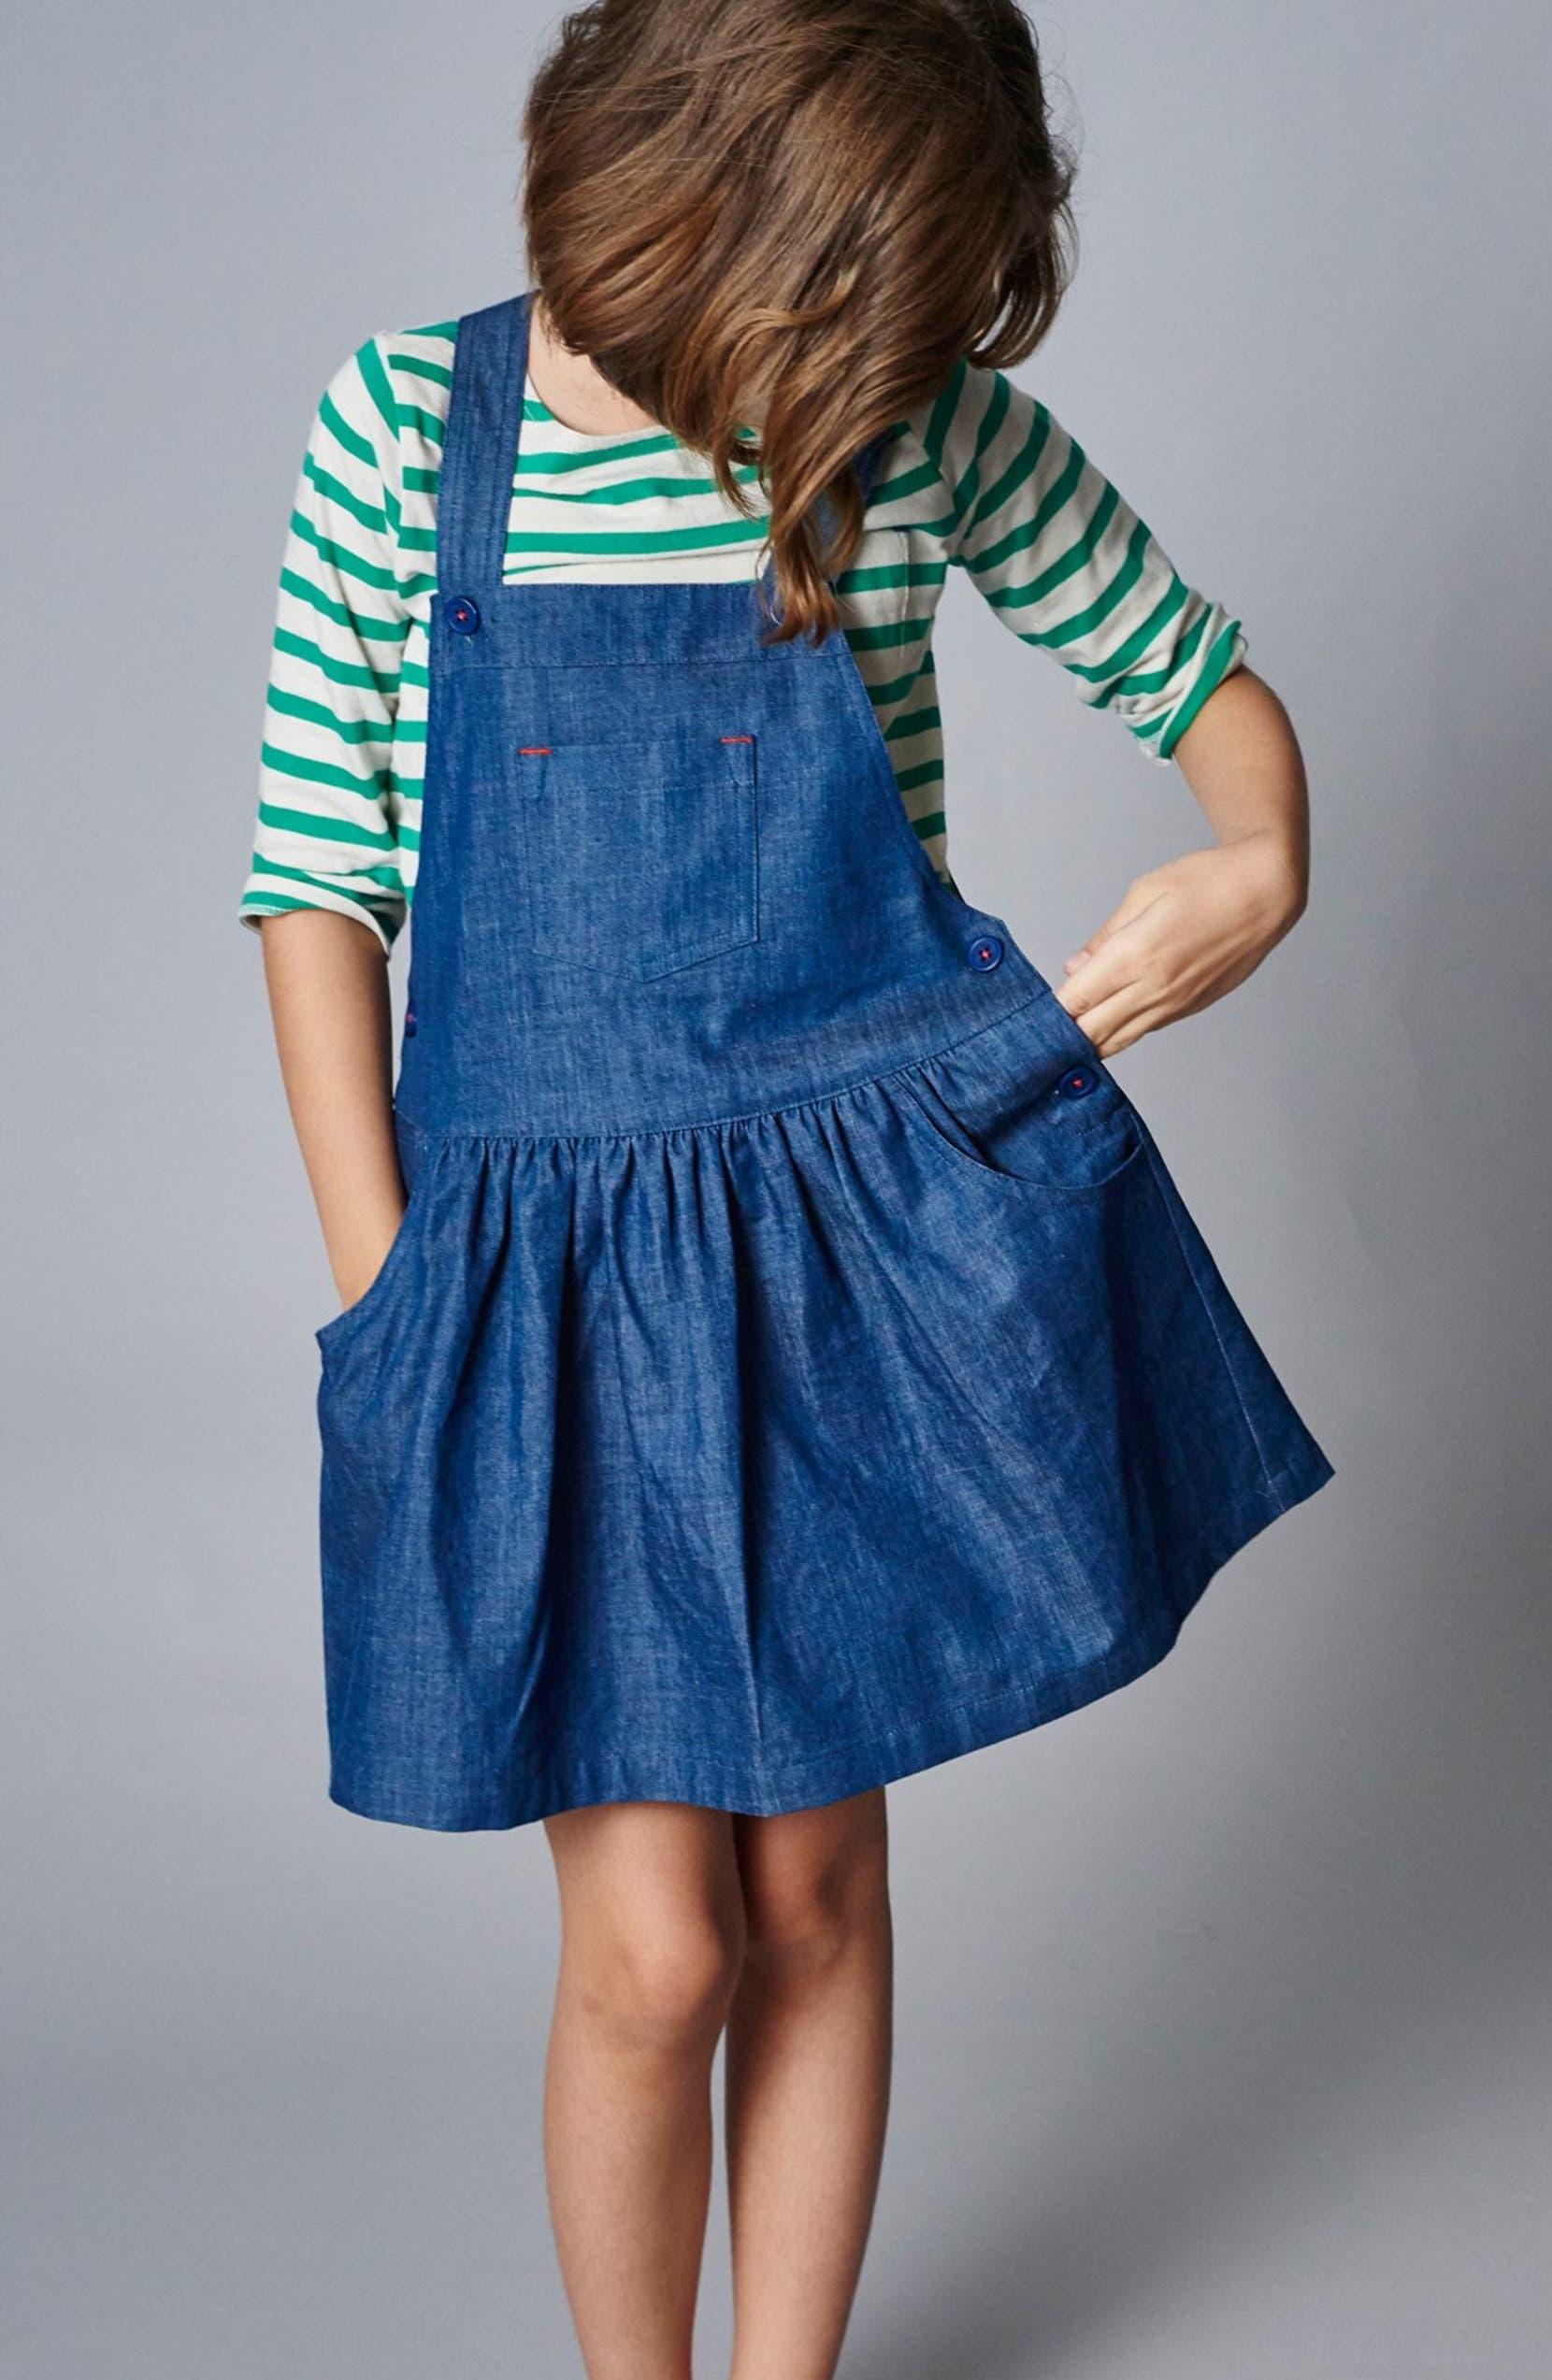 167a1e1138c61 Mini Boden 'Dungaree' Overall Dress (Toddler Girls, Little Girls & Big Girls)  | Nordstrom